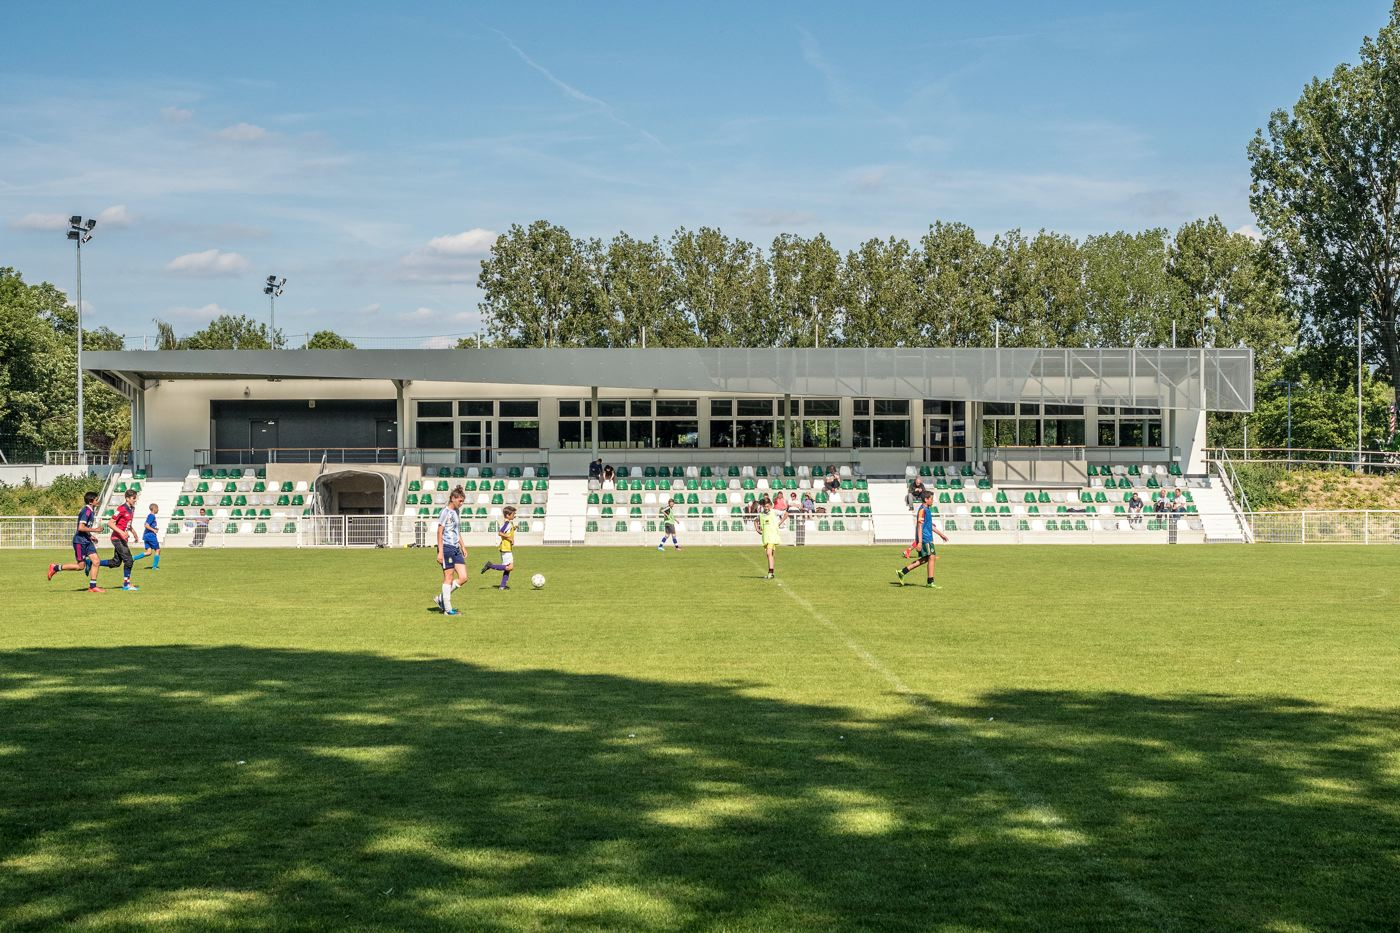 LDKphoto-EFarchi-Stade-Jean-Jacques-034.jpg